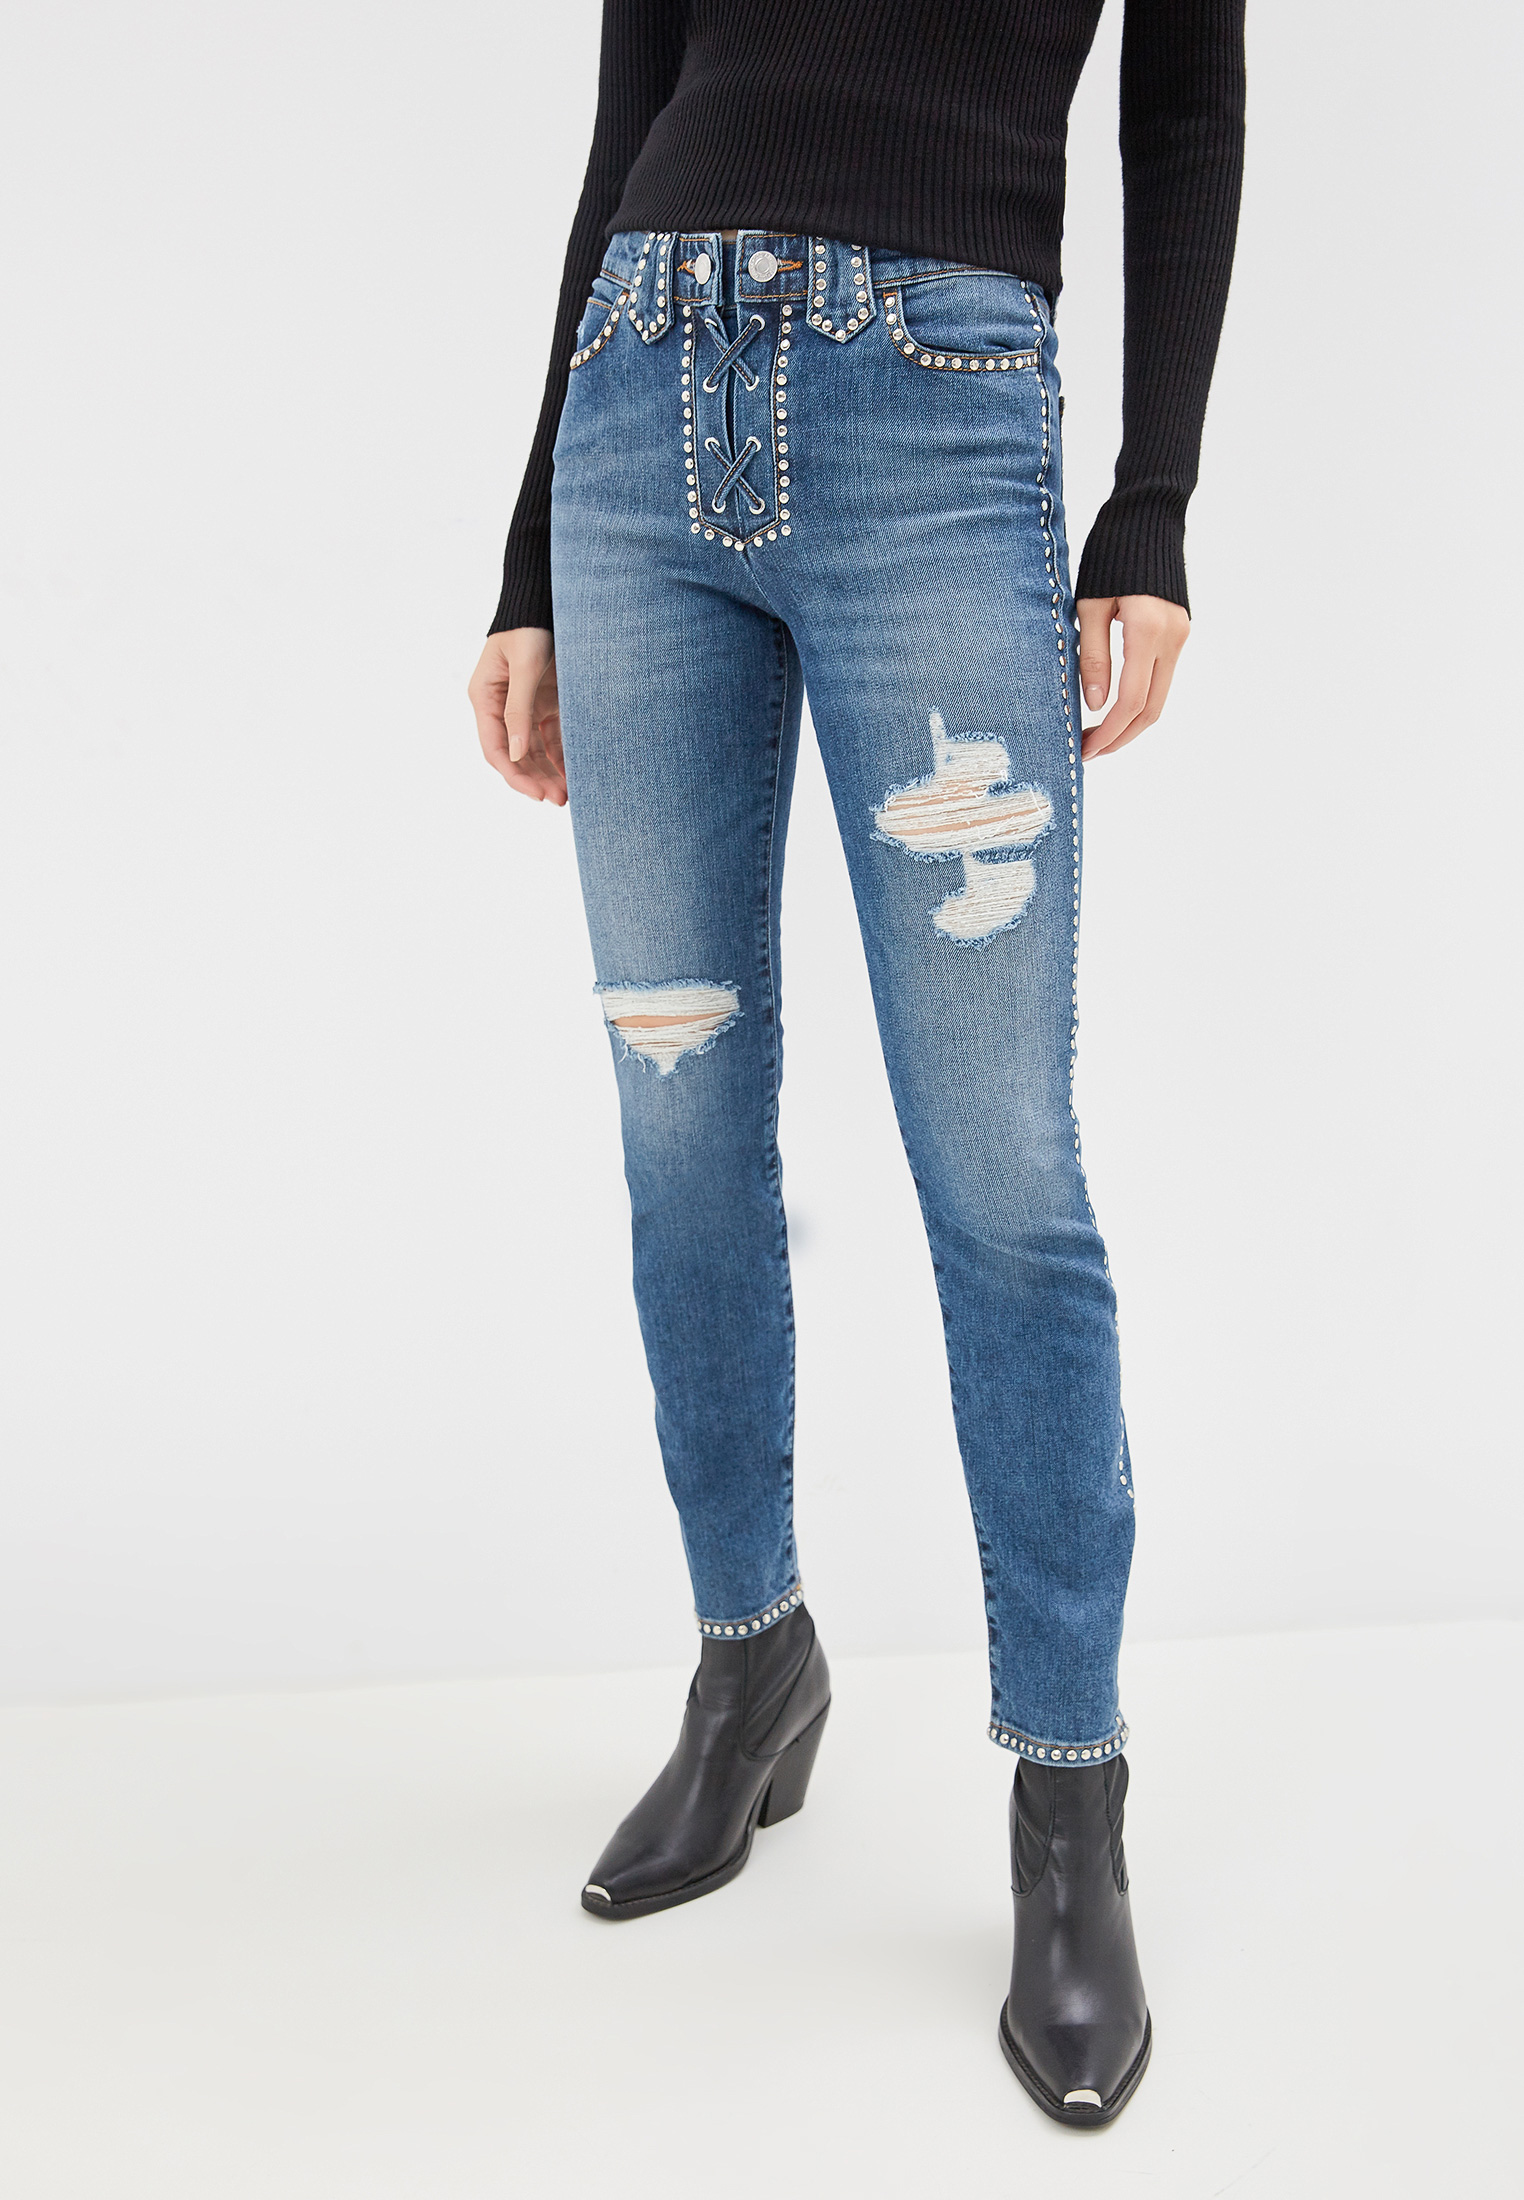 Прямые джинсы Guess Jeans w93a72 d3oj0